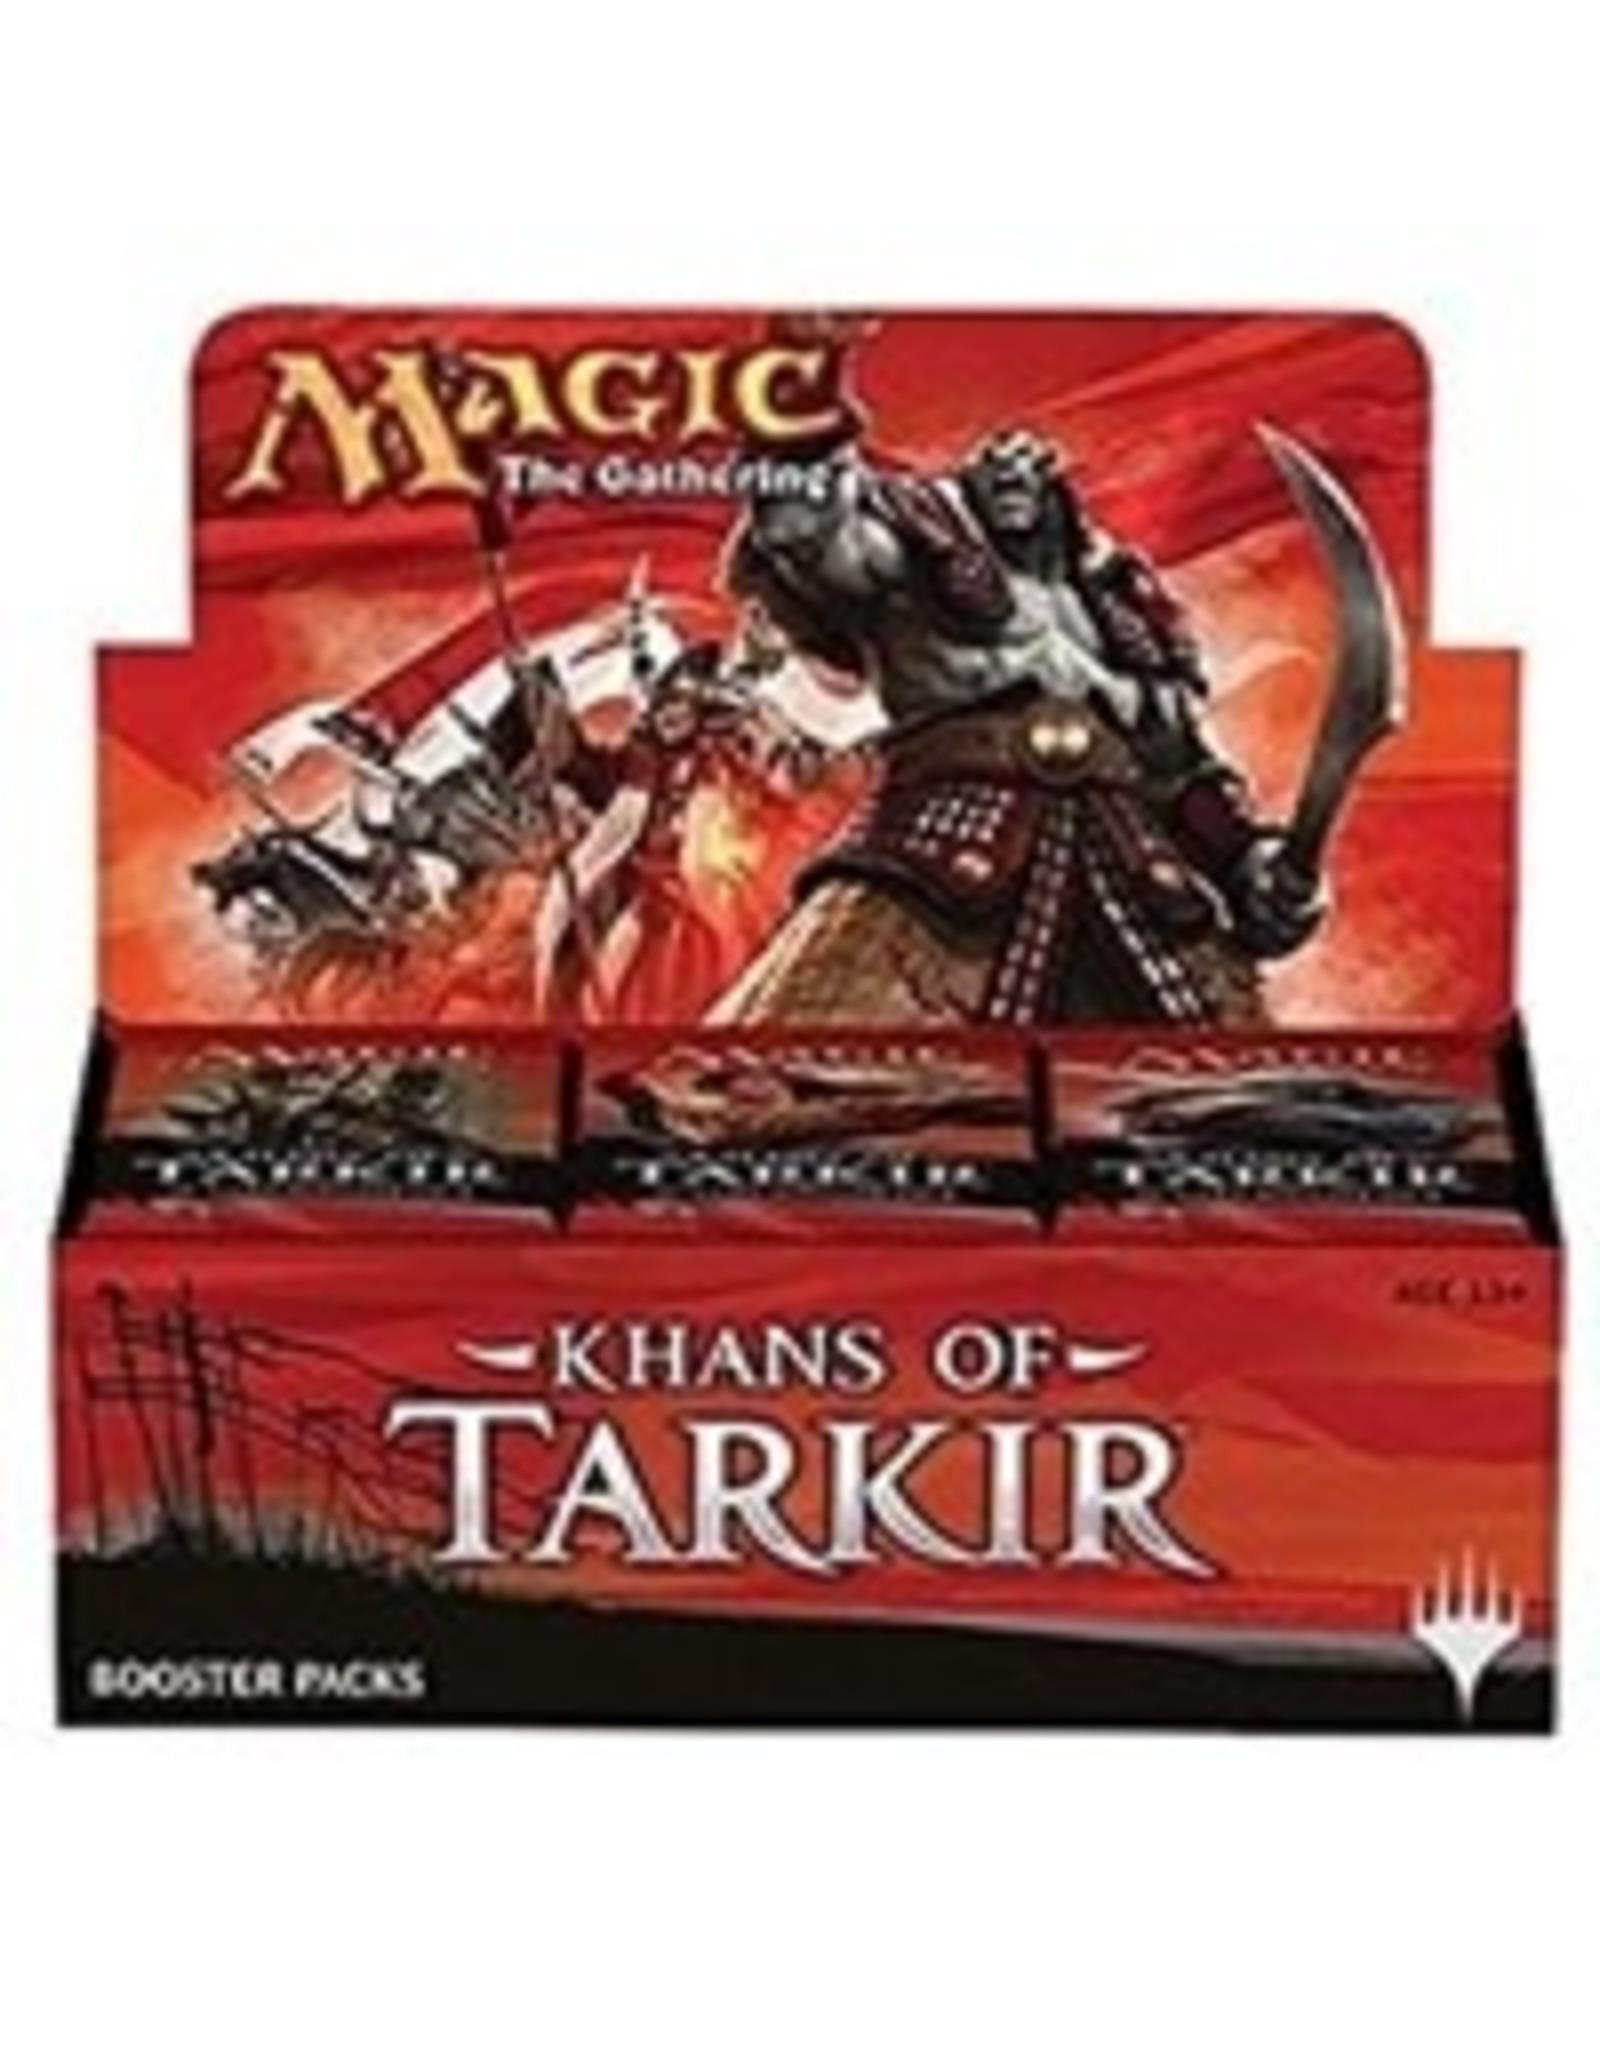 Magic MTG: Khans of Tarkir Booster Box